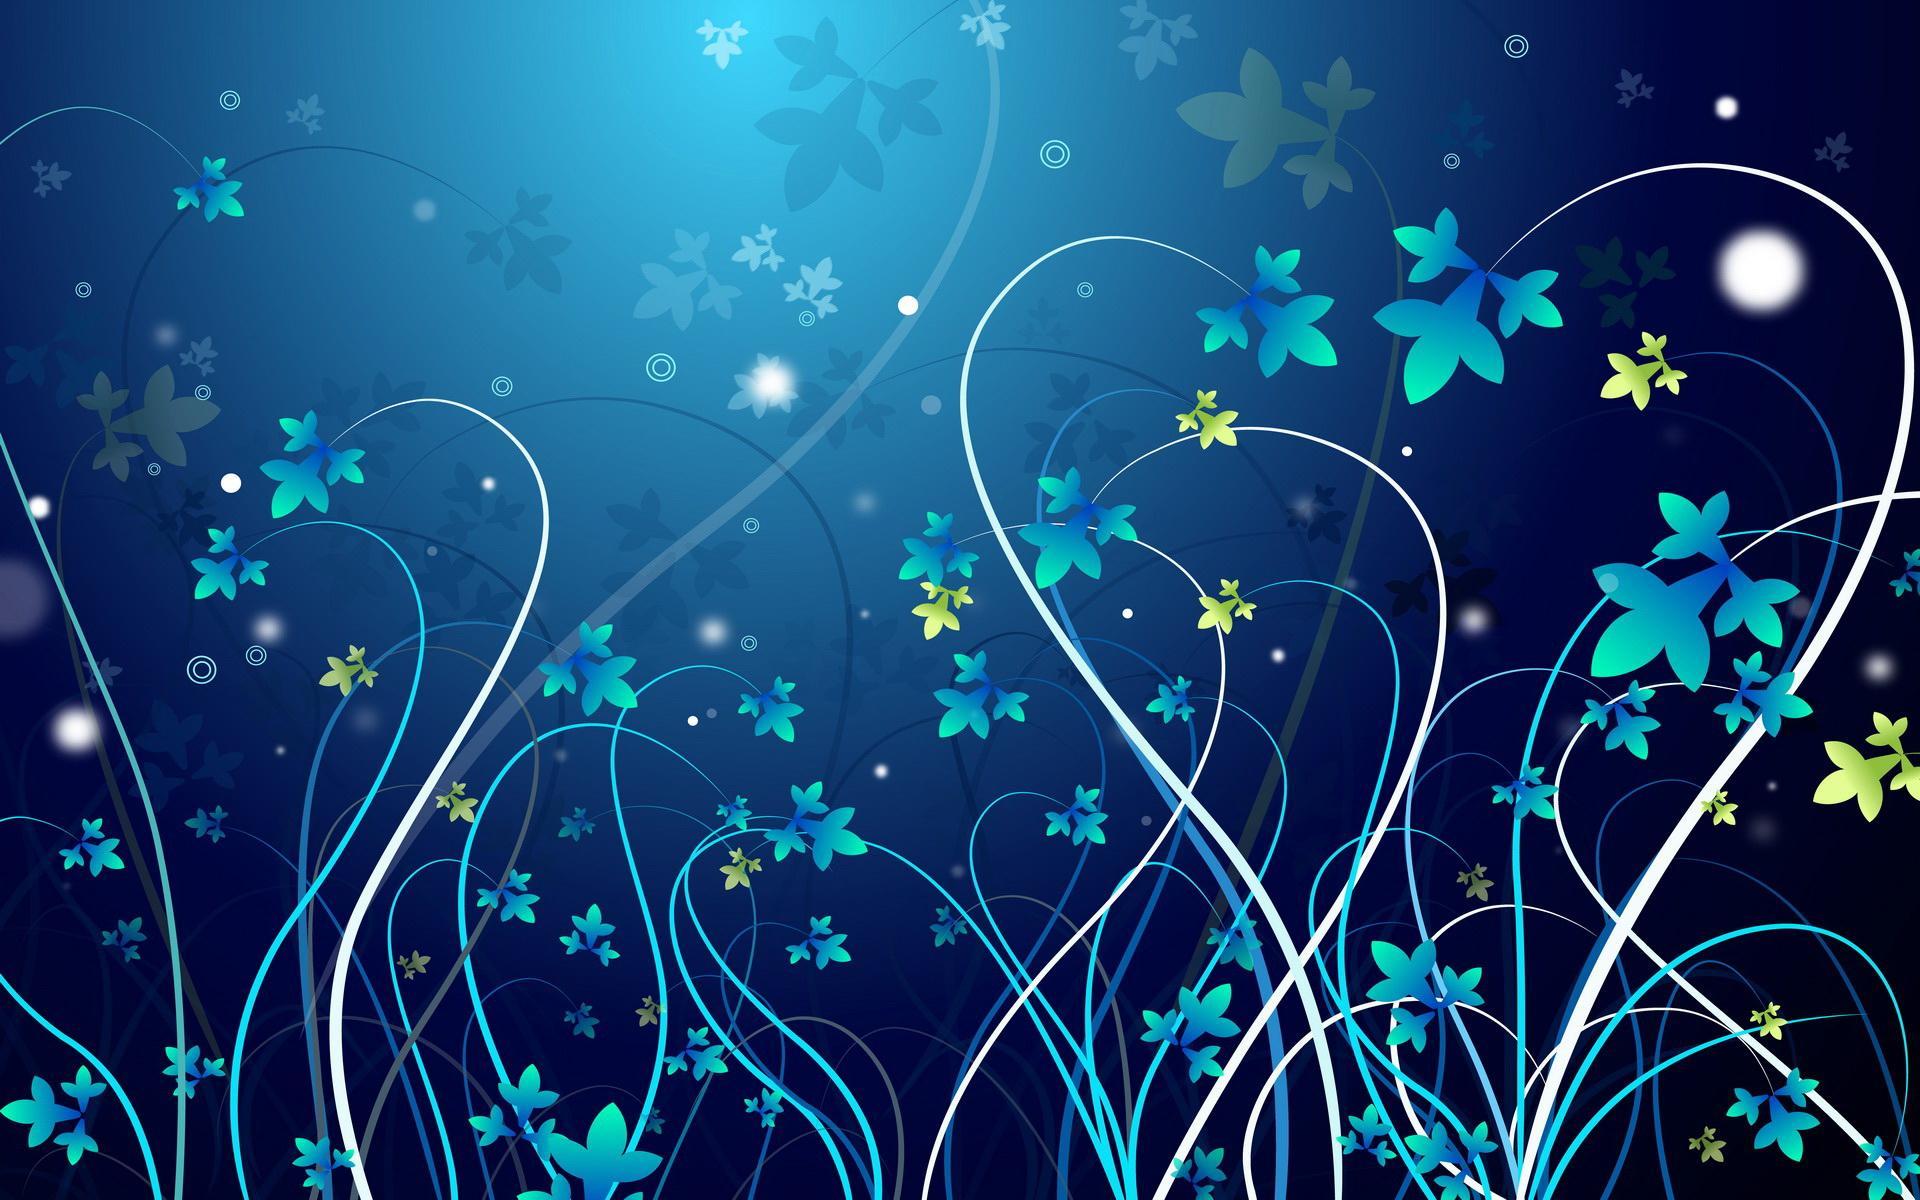 71 Blue Flower Backgrounds On Wallpapersafari